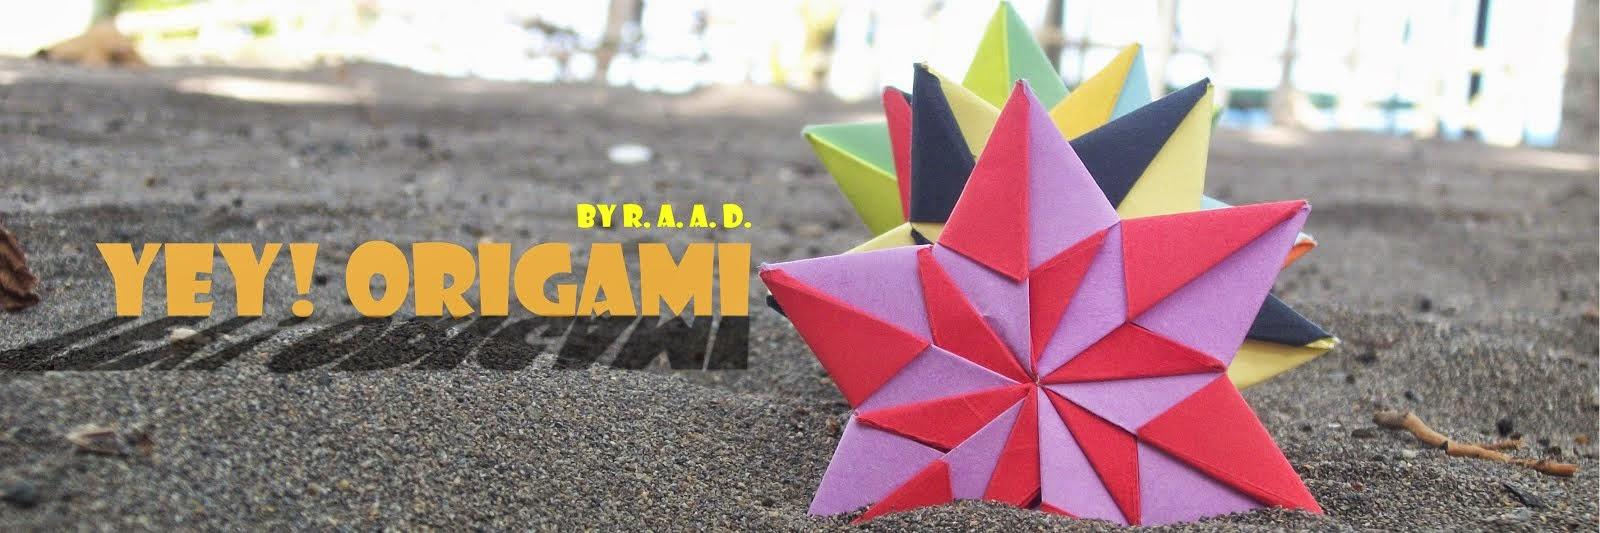 Yey! Origami